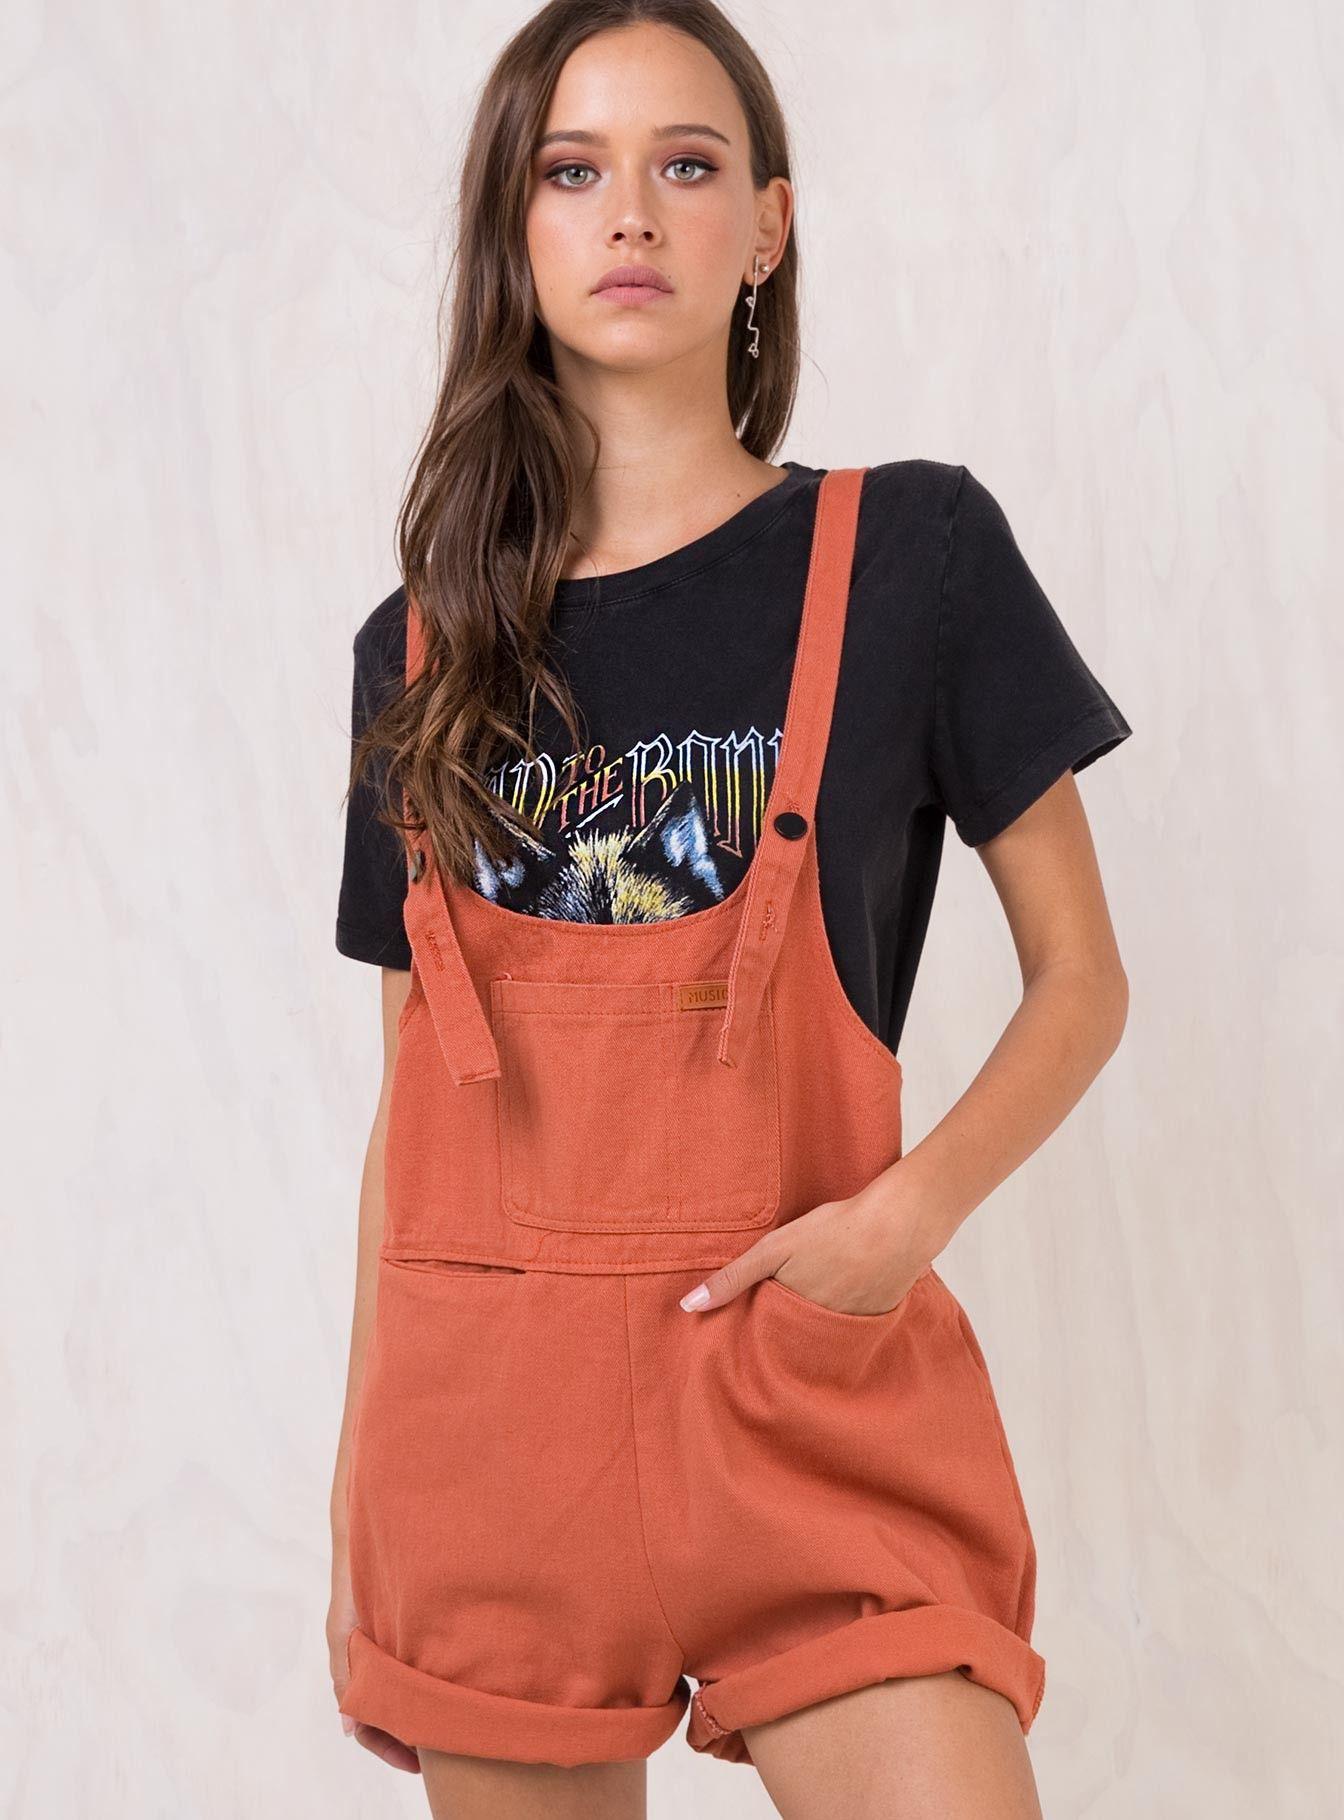 cb9e1aec6e Rust+Sloan+Denim+Overalls+-+ Oversized+denim+overalls 5+Pocket+design  Low+cut+scoop+neckline Adjustable+straps+with+button+fastening  Folded+cuff+on+shorts ...